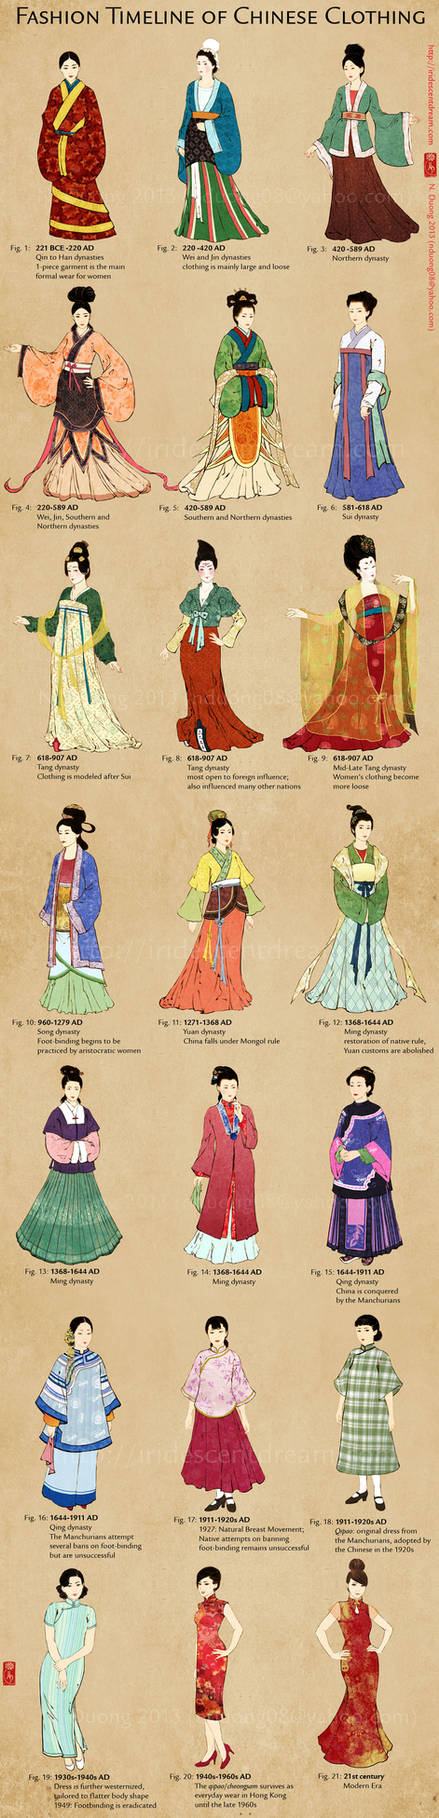 Evolution of Chinese Clothing and Cheongsam/Qipao